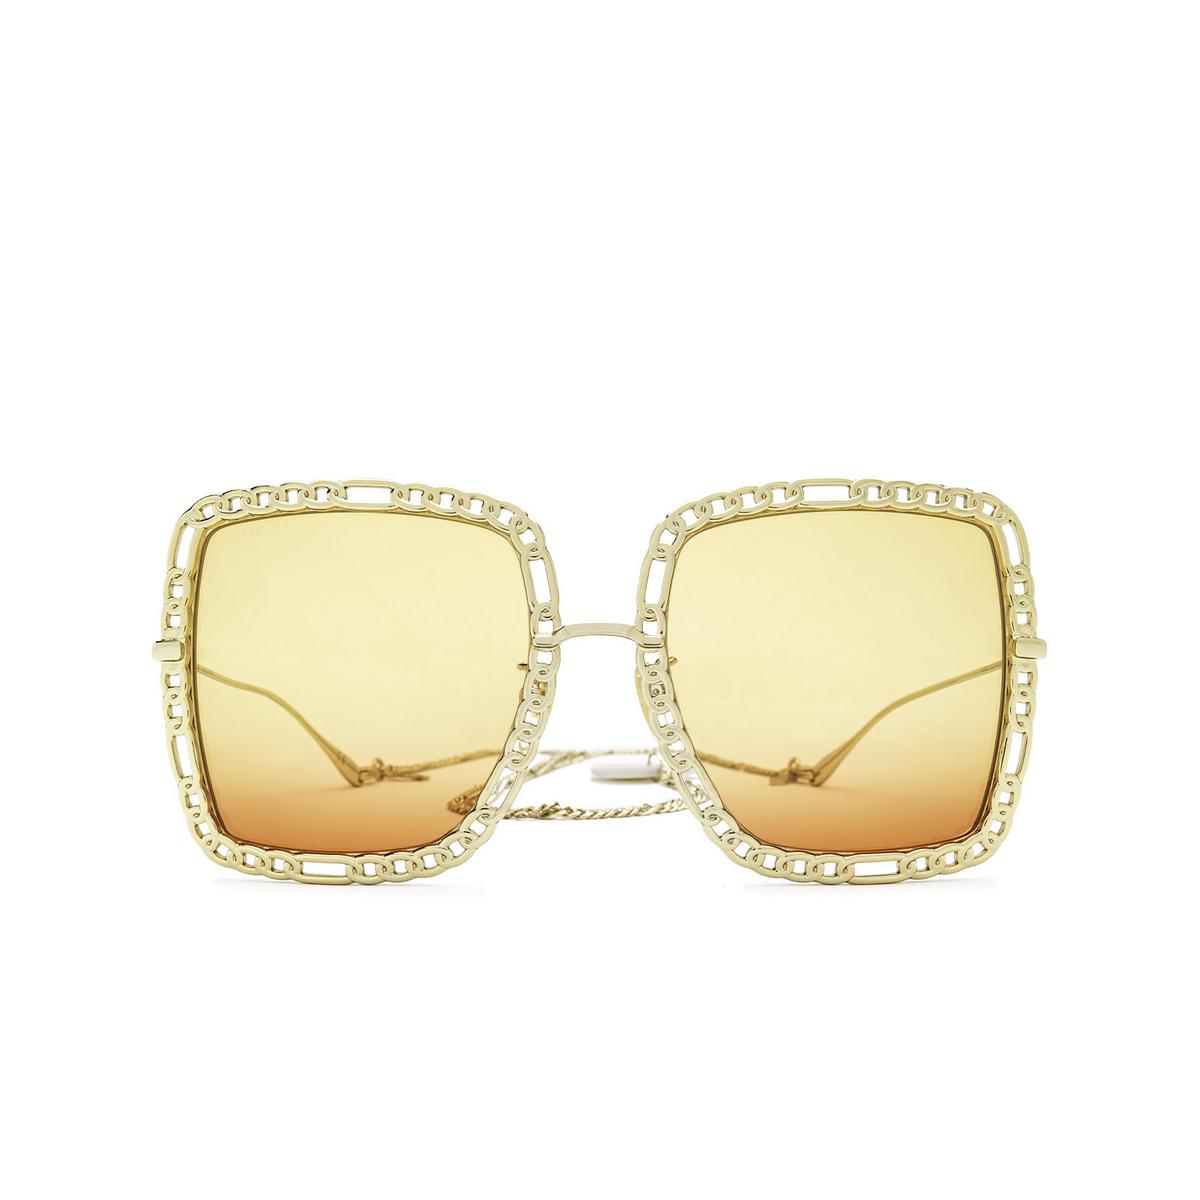 Gucci® Square Sunglasses: GG1033S color Gold 001 - front view.